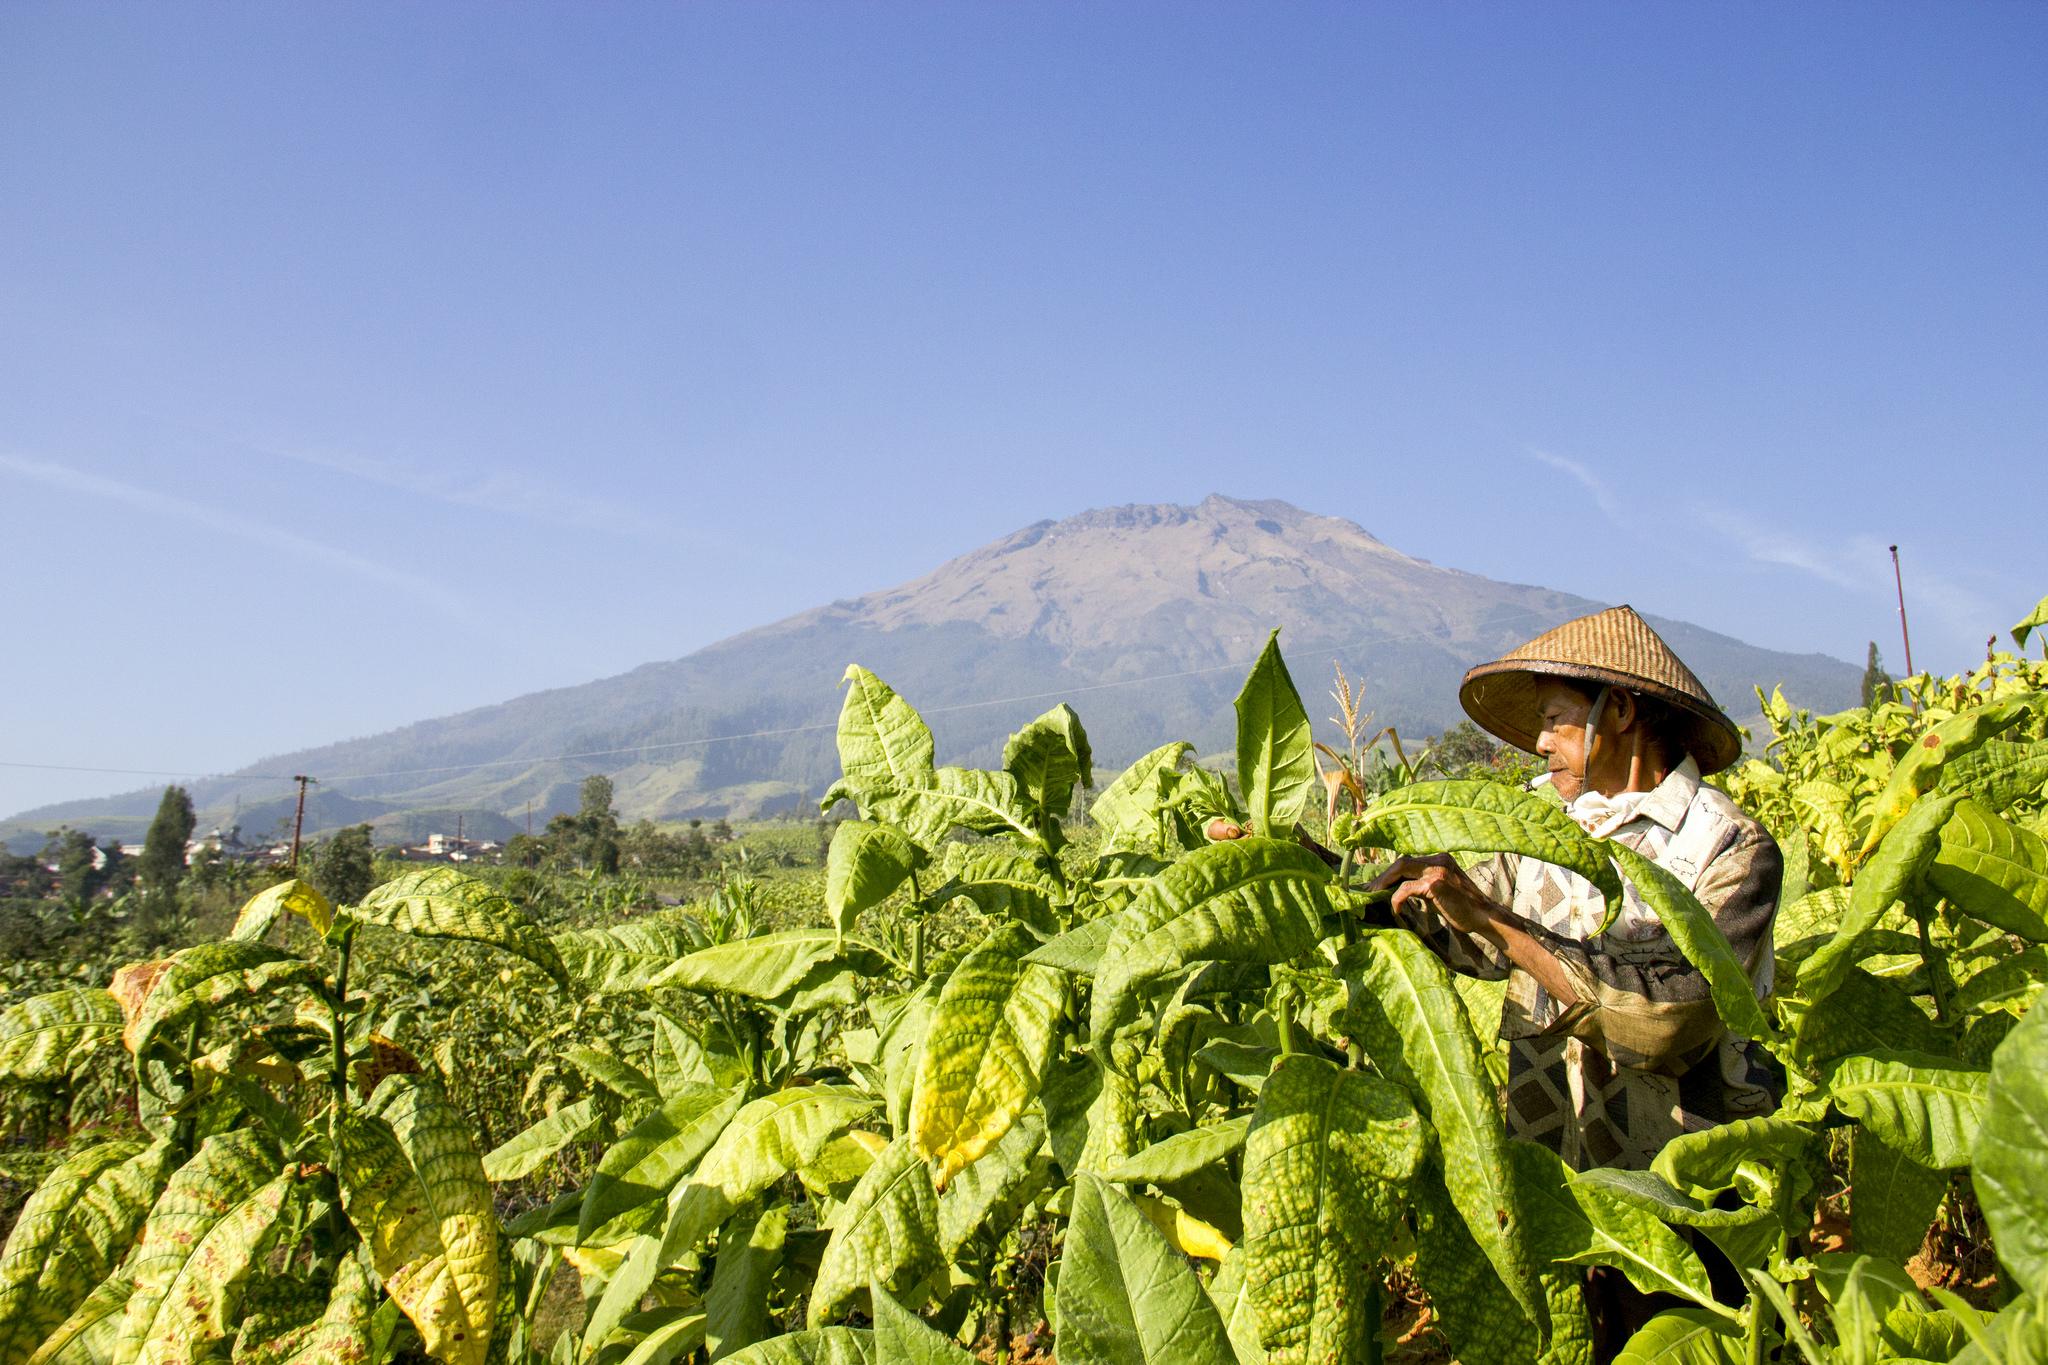 Teruslah Menanam Tembakau dan Cengkeh, Wahai Petani Indonesia